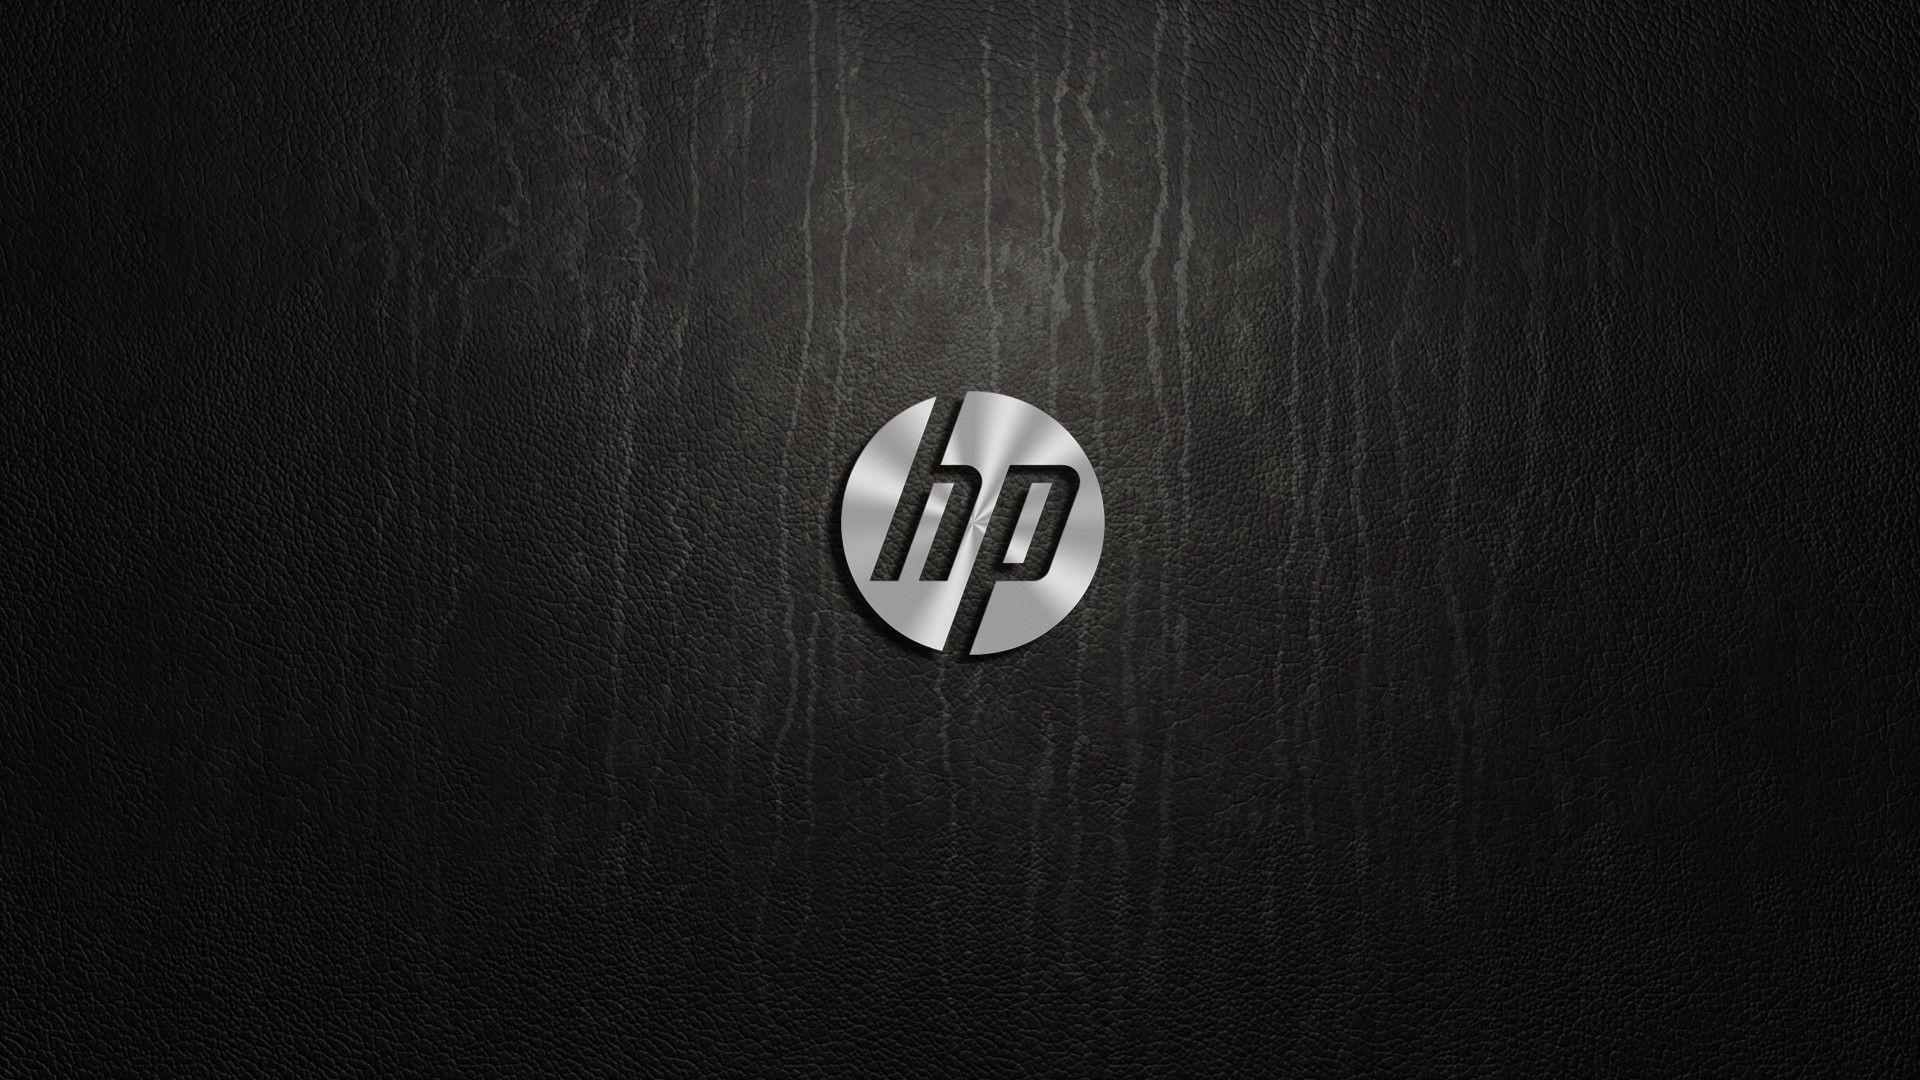 HP 4K Wallpapers   Top HP 4K Backgrounds   WallpaperAccess 1920x1080